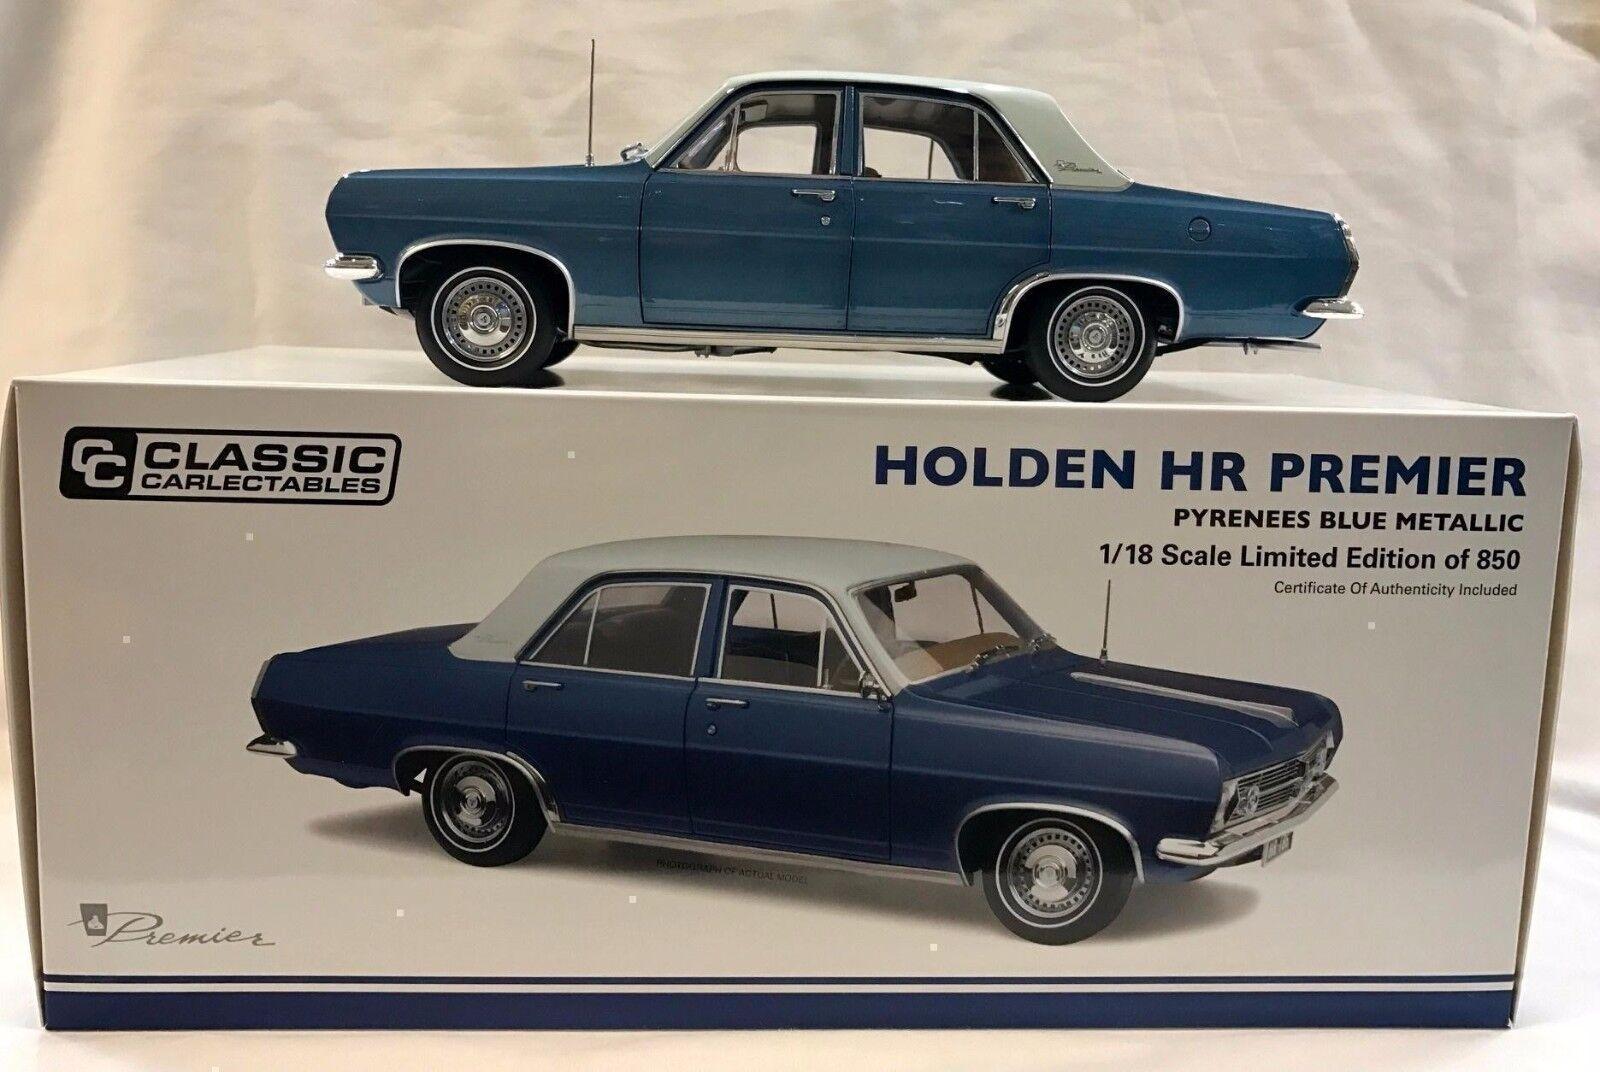 37514 HR Premier Holden Pirineo Metálico blu Die cast Modelo de Coche 1 18